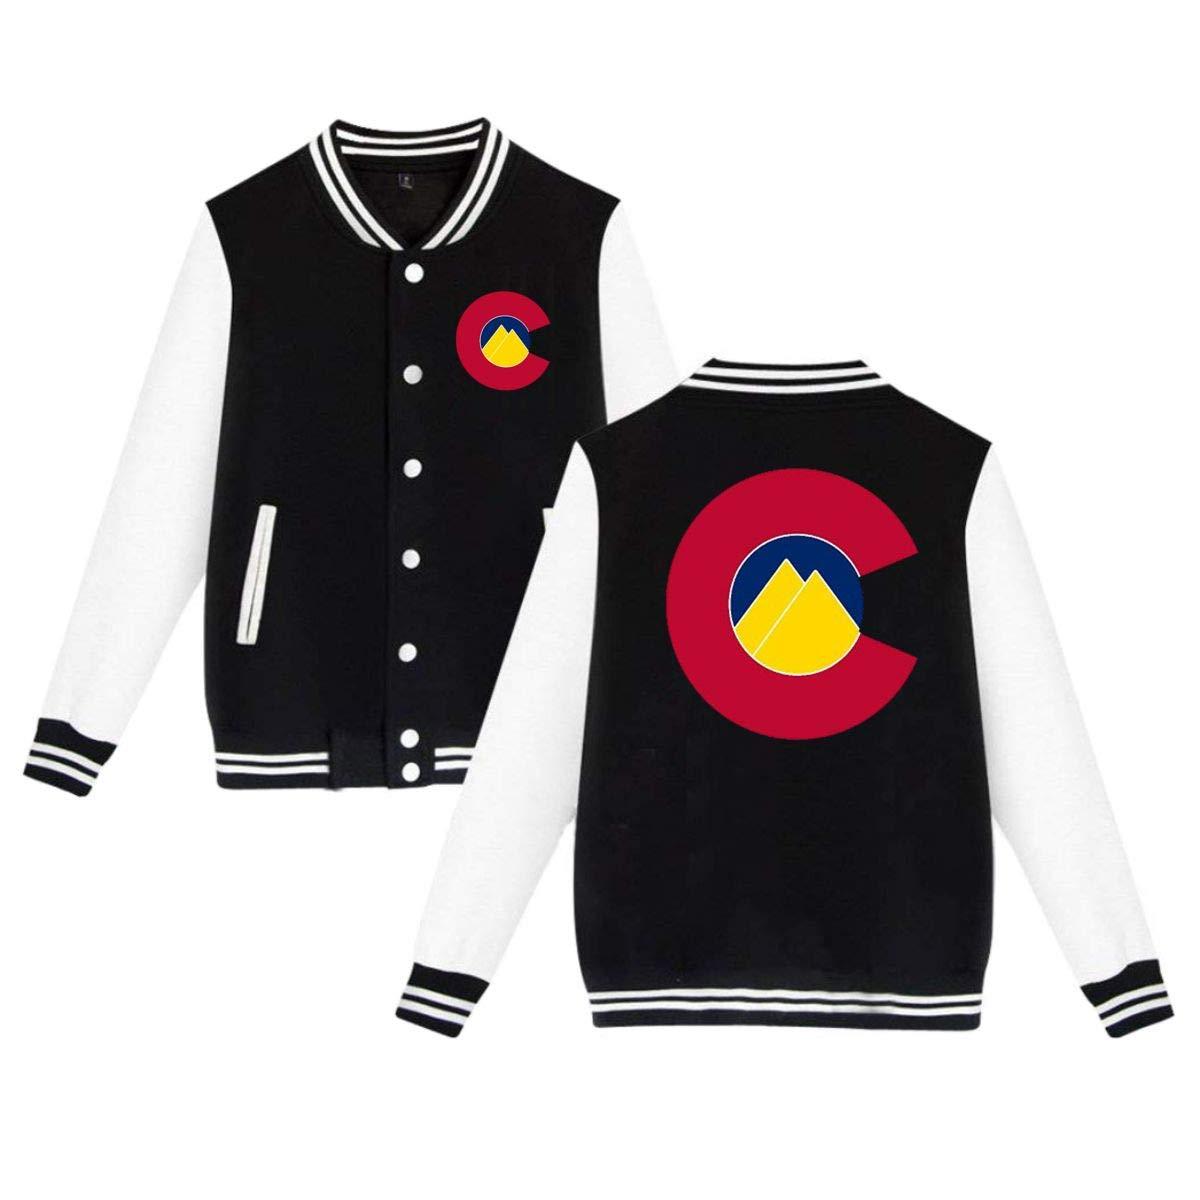 MEILOP Unisex Colorado State Mountain Flag Baseball Jacket Uniform Sweater Coat